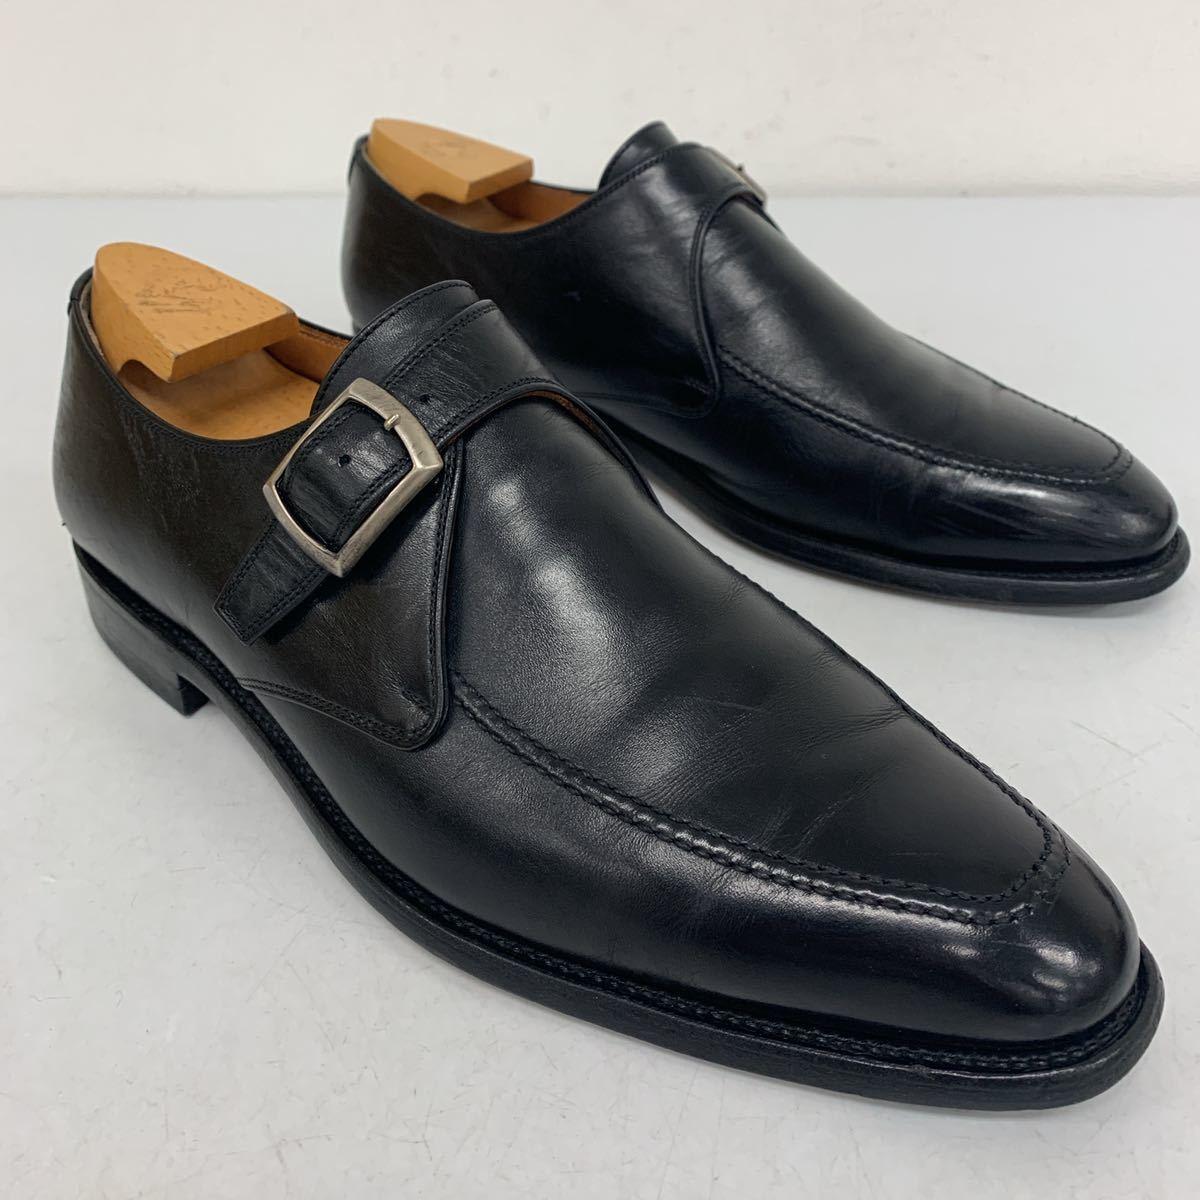 C ☆ 日本製 SCOTCH GRAIN スコッチグレイン 匠 HIROKAWA 本革 モンクストラップ ビジネスシューズ 革靴 25.5cm 黒 BLK メンズ 高級紳士靴